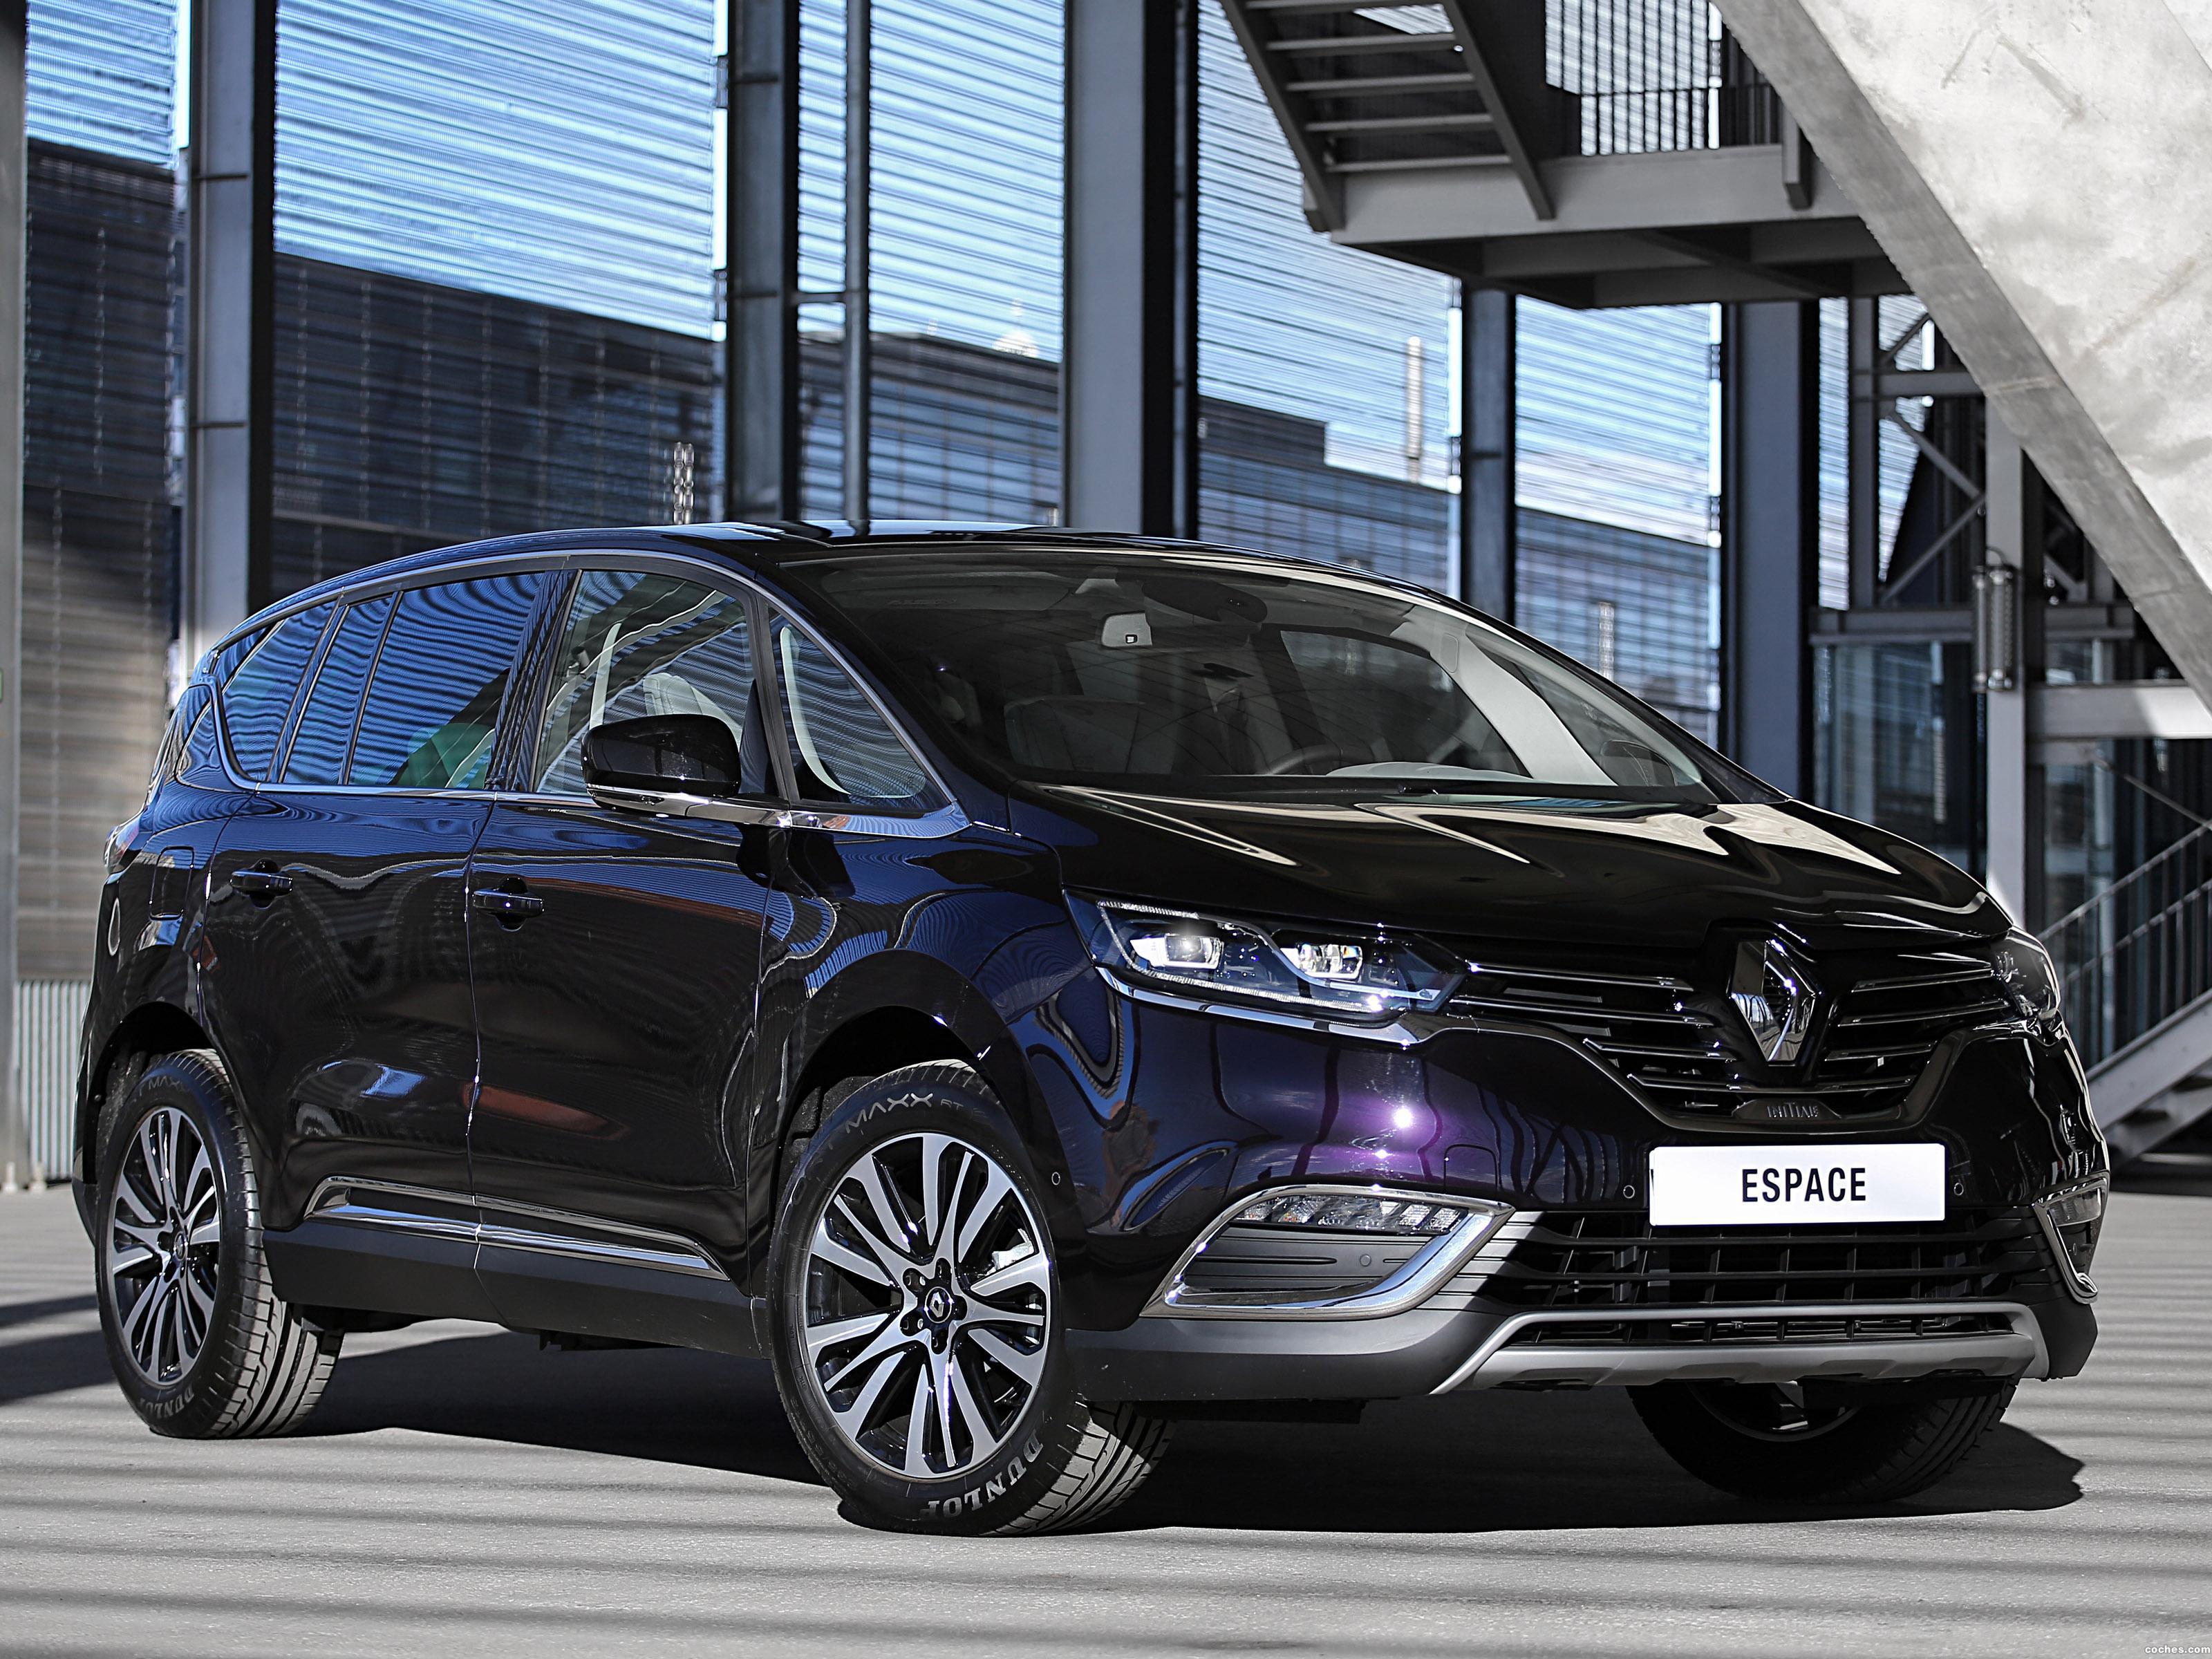 Foto 13 de Renault Espace Initiale 2015